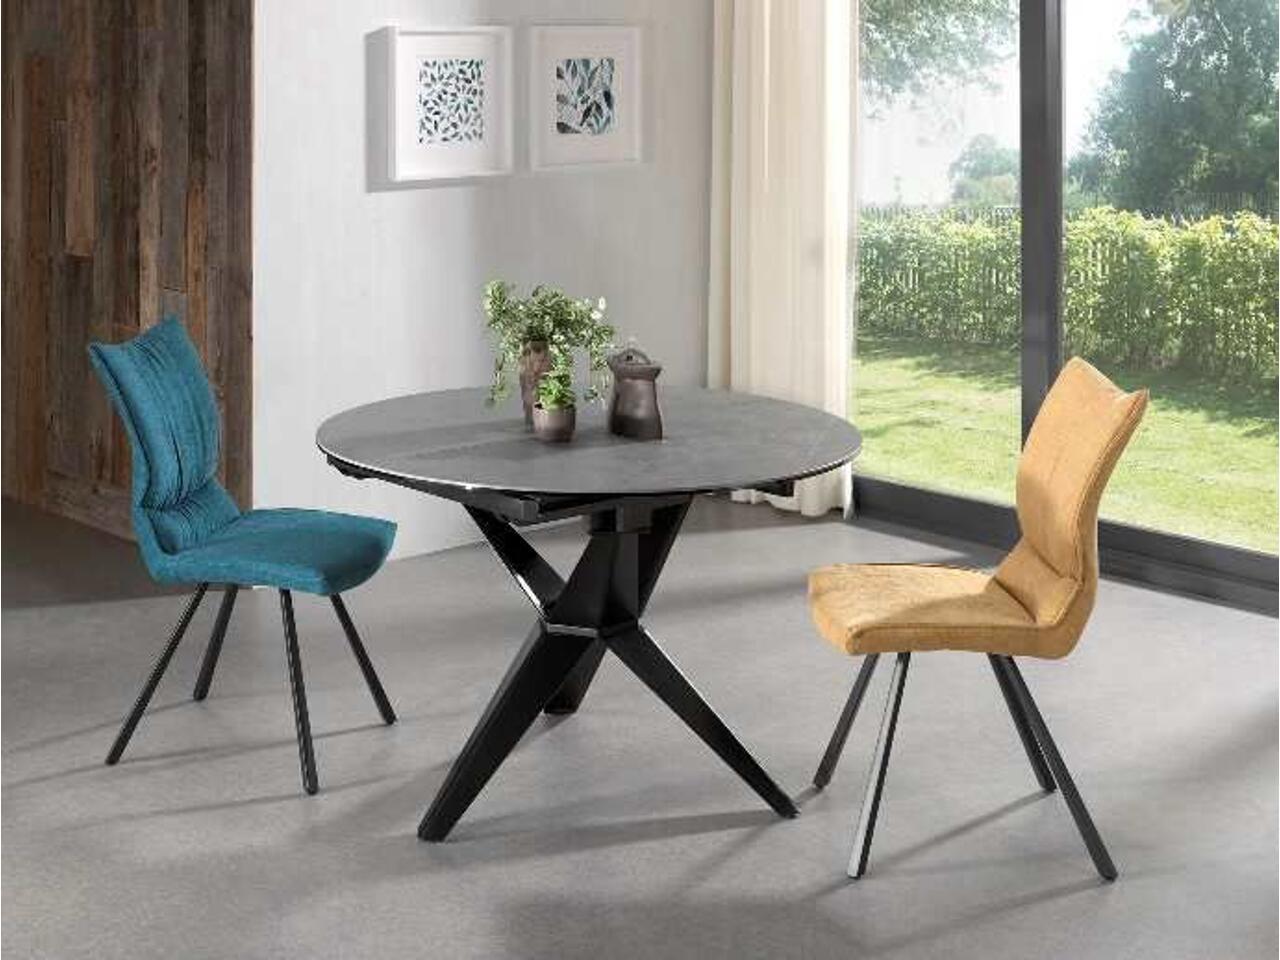 table ronde extensible a st junien